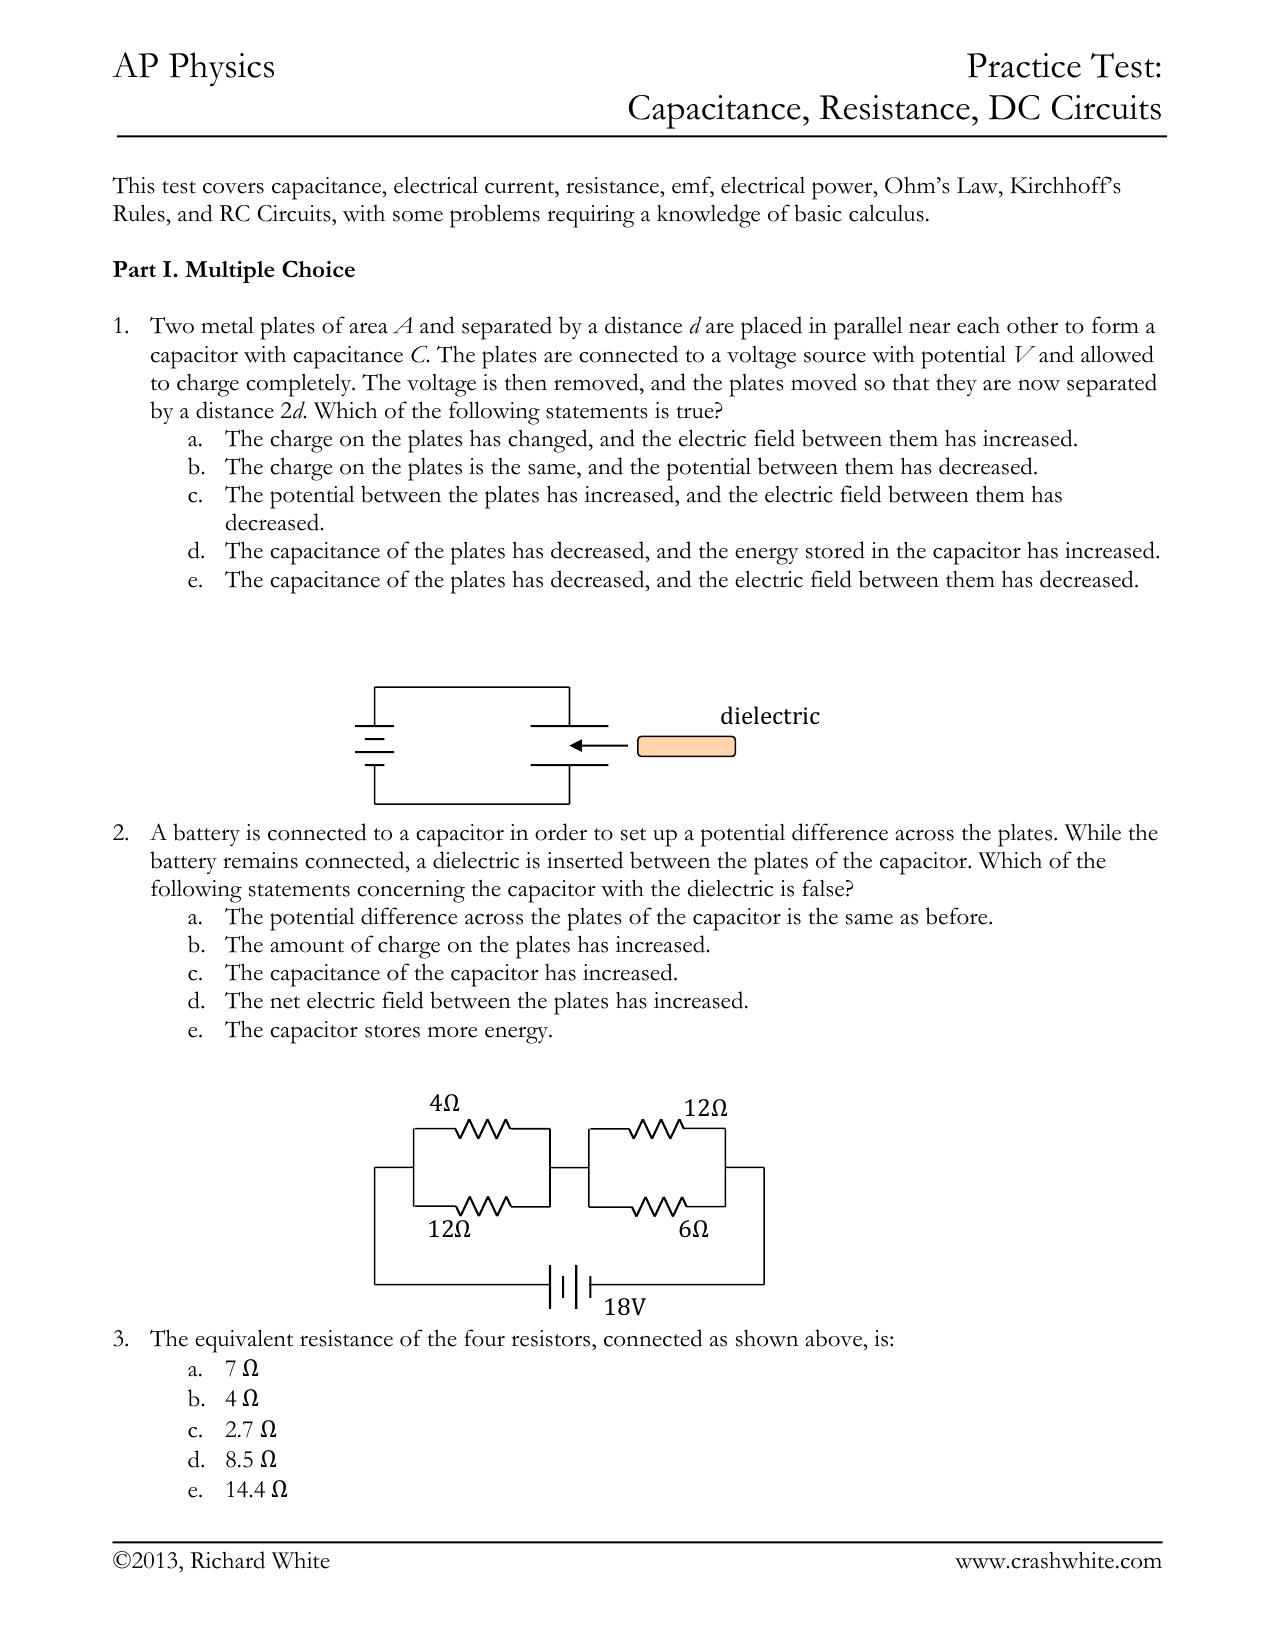 practice test-9-capacitance-resistance-dc circuits